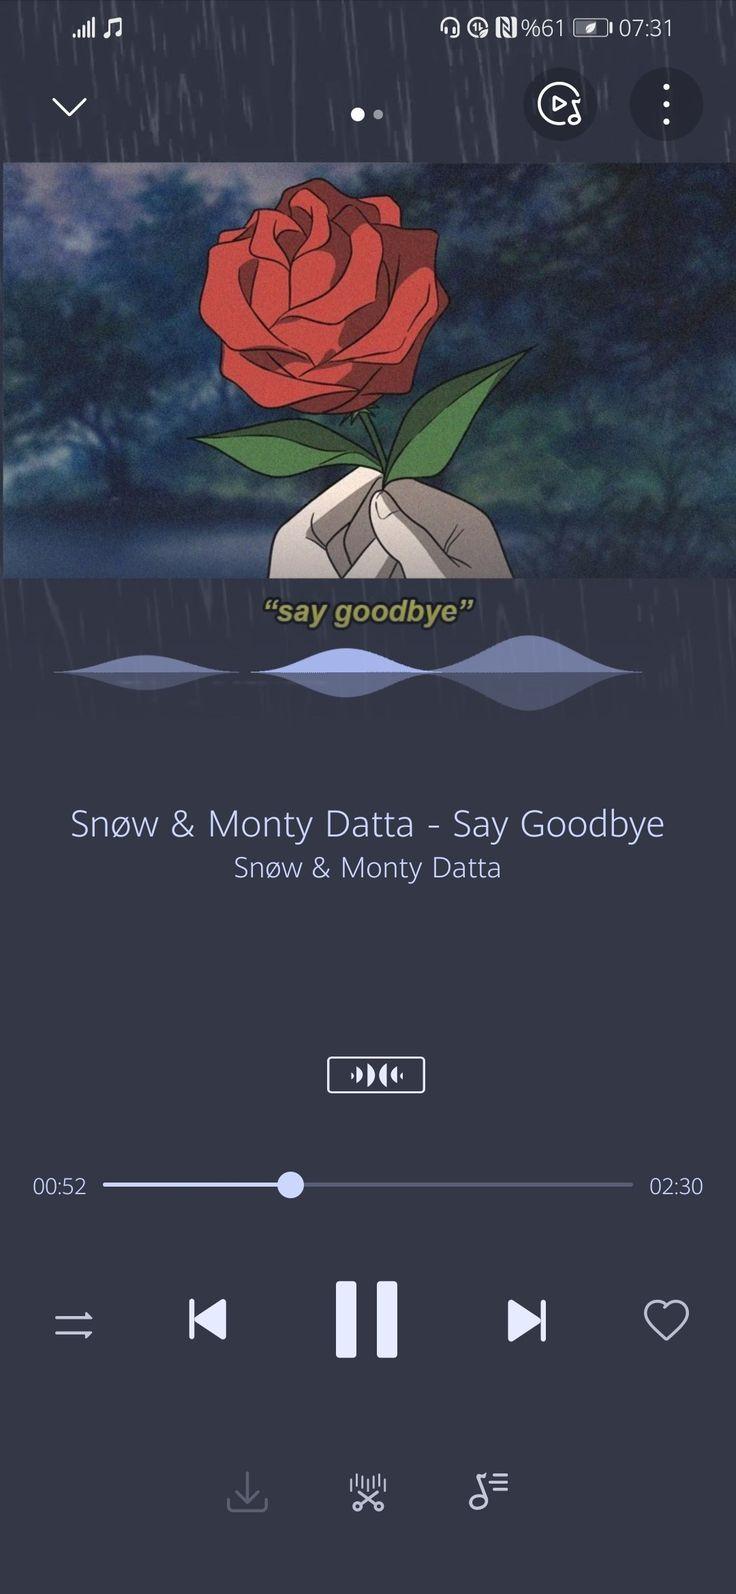 snow montydatta saygoodbye song wallpaper, 2020